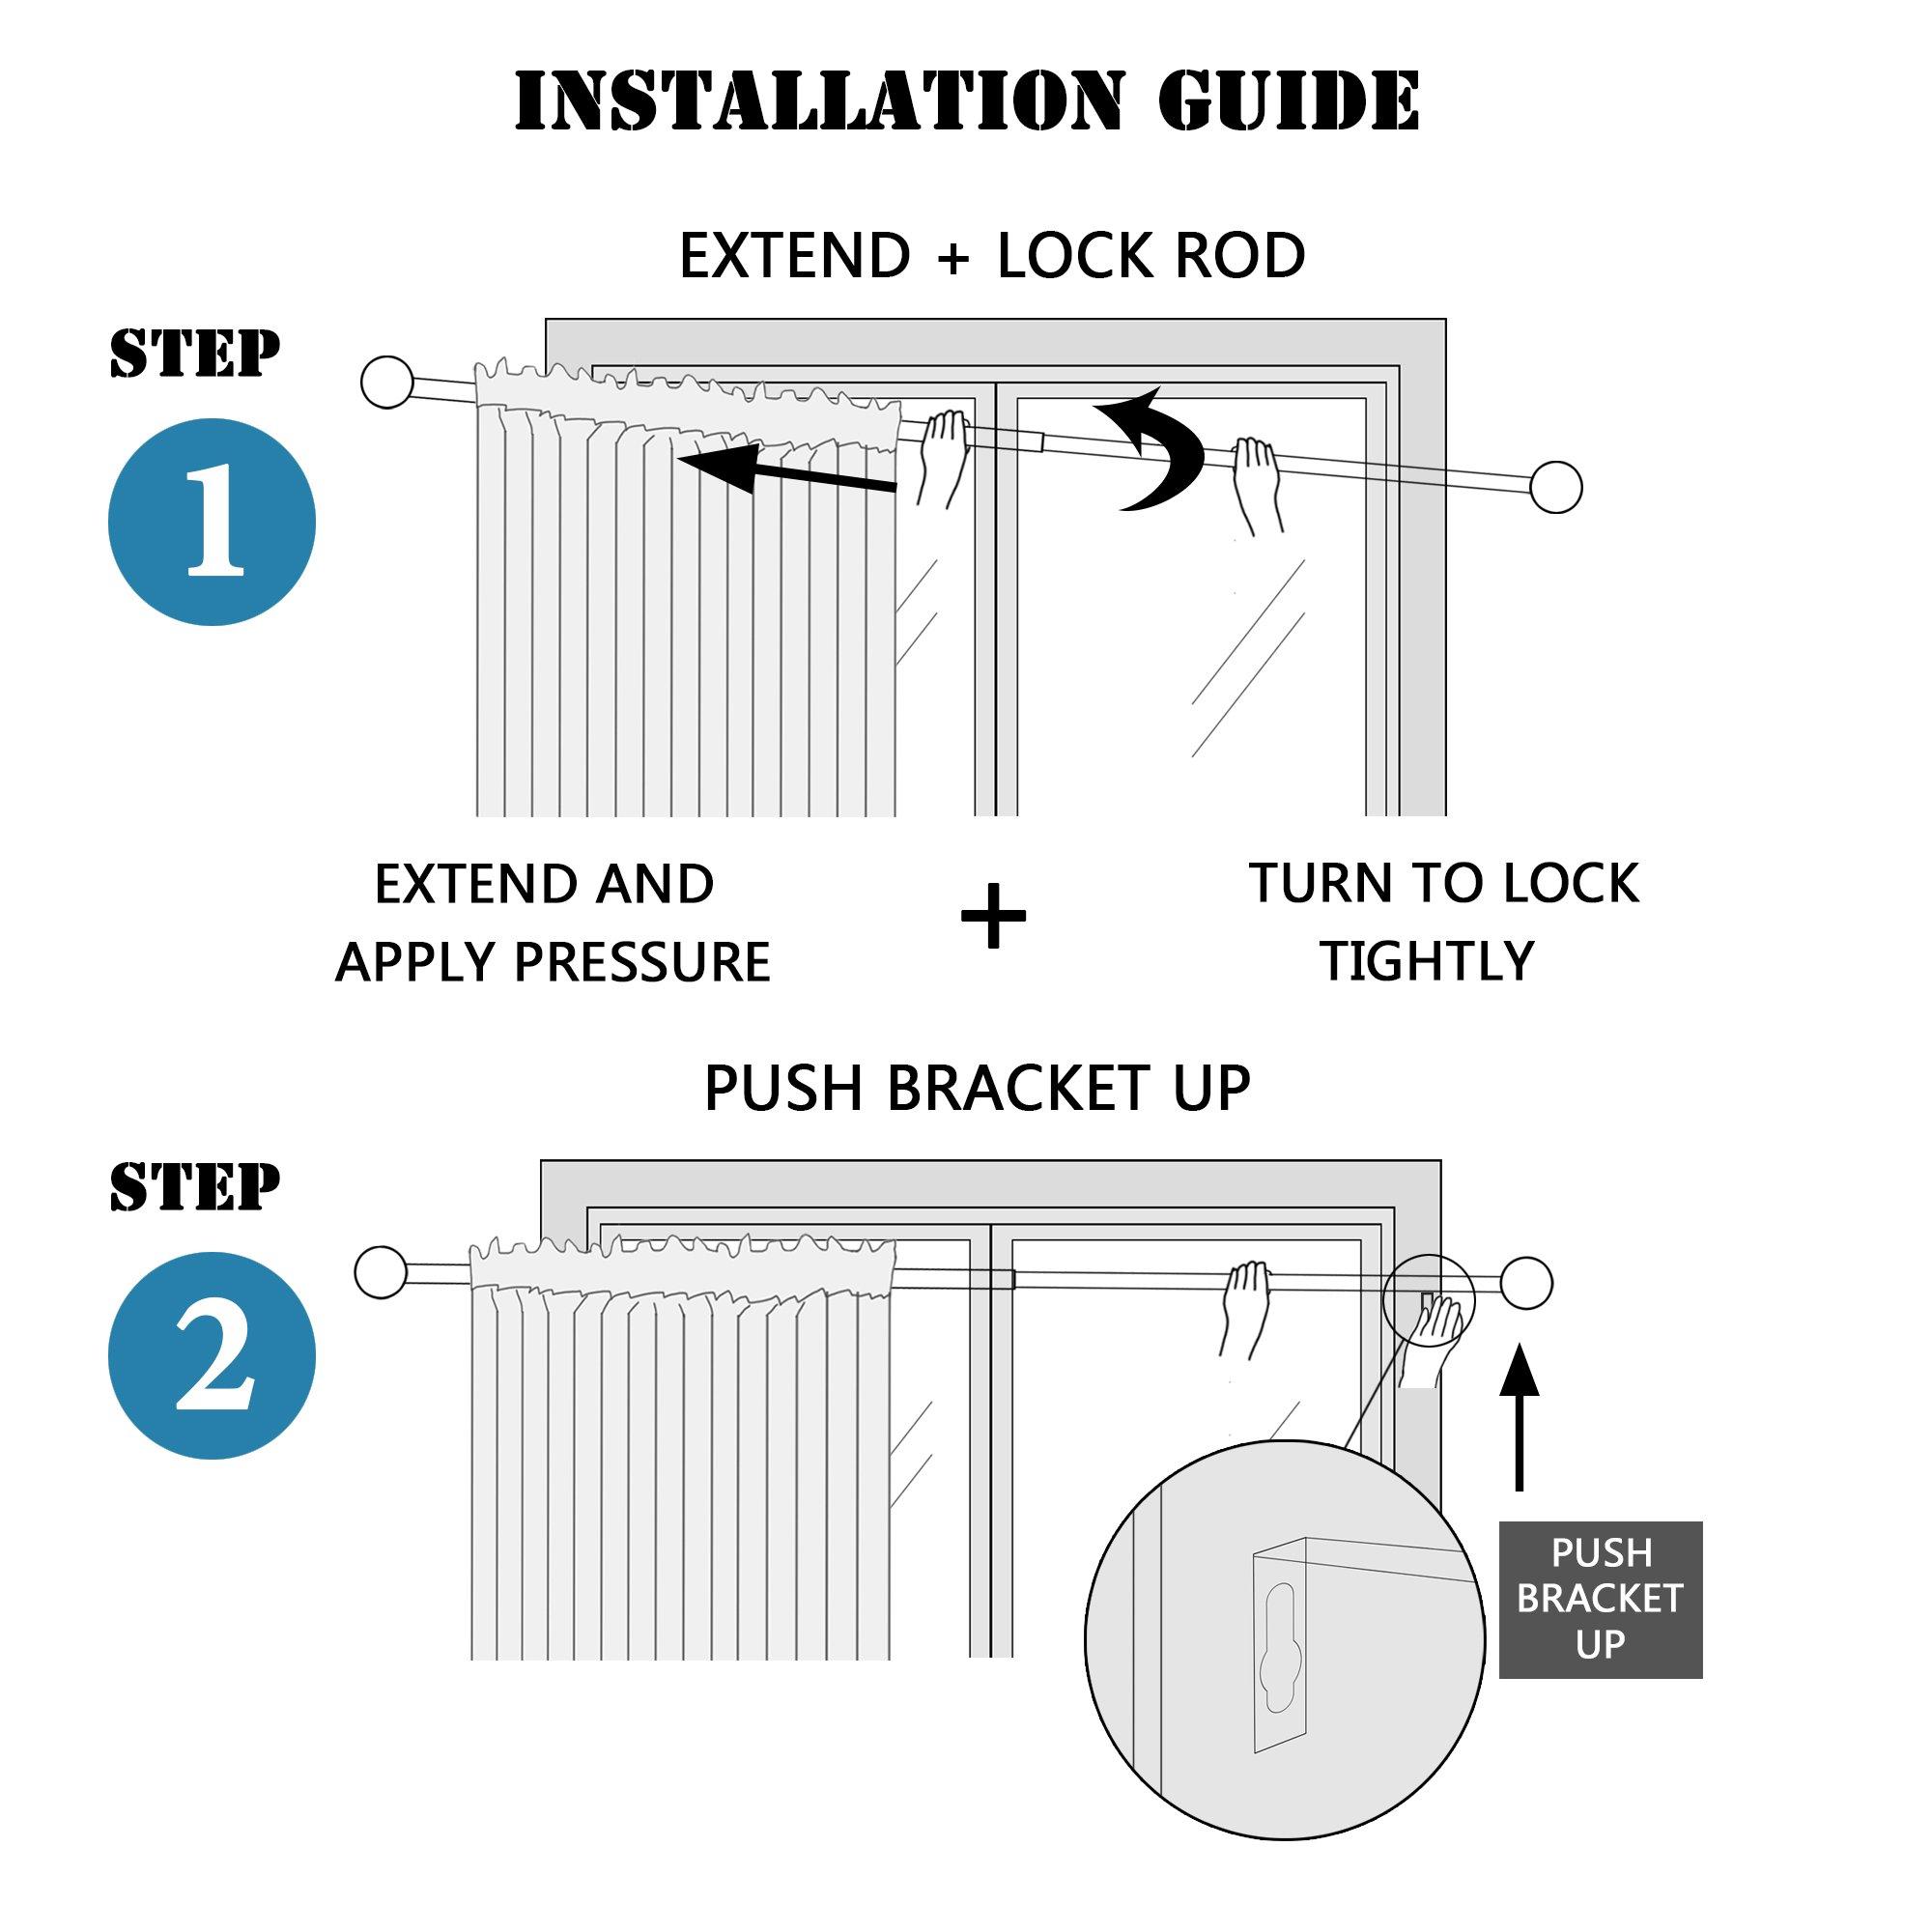 H.VERSAILTEX Window Curtain Rod, Adjusts Rod Length from 48 to 84-Inch,3/4 - Inch Diameter, Black (Antique Bronze Finishing) by H.VERSAILTEX (Image #6)